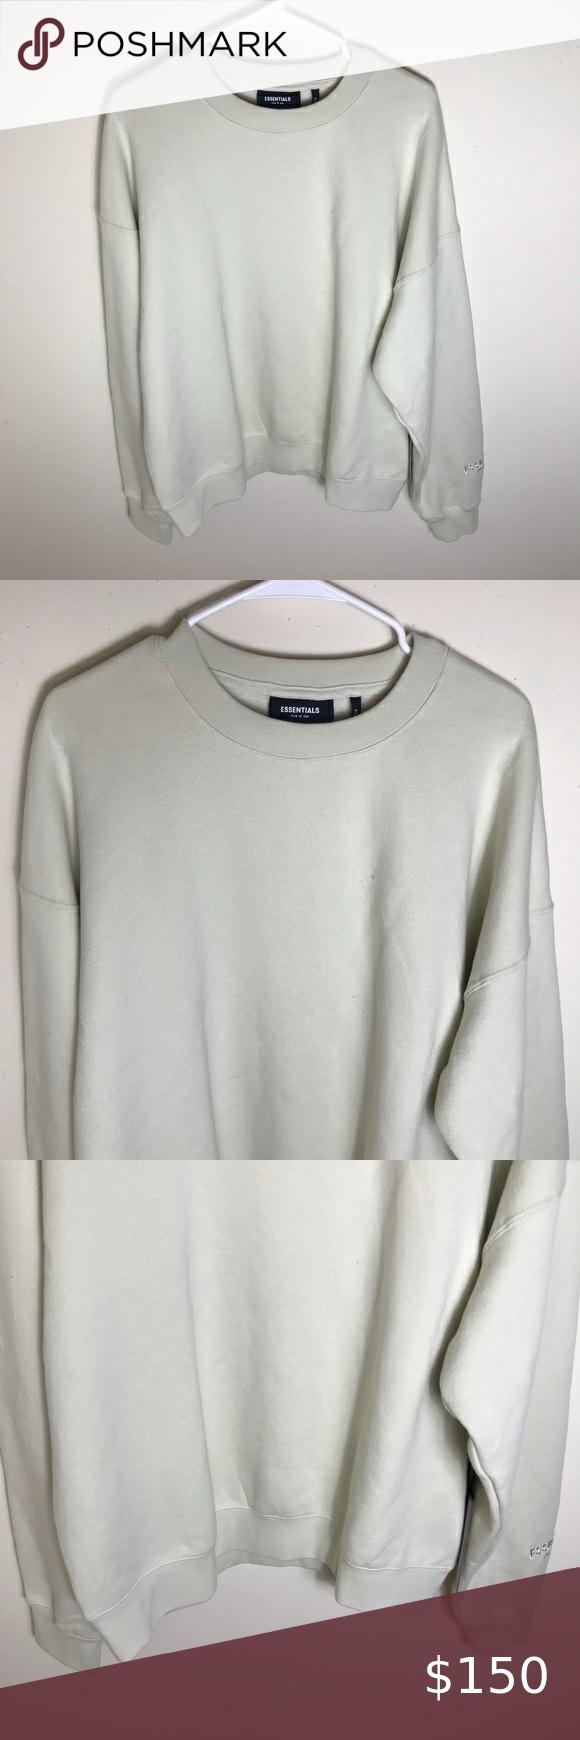 Fear Of God Essentials Cream Crewneck Sweatshirt Size Medium Oversized Fit Cream Off White Color Emb Crew Neck Sweater Crew Neck Sweatshirt Sweaters For Women [ 1740 x 580 Pixel ]